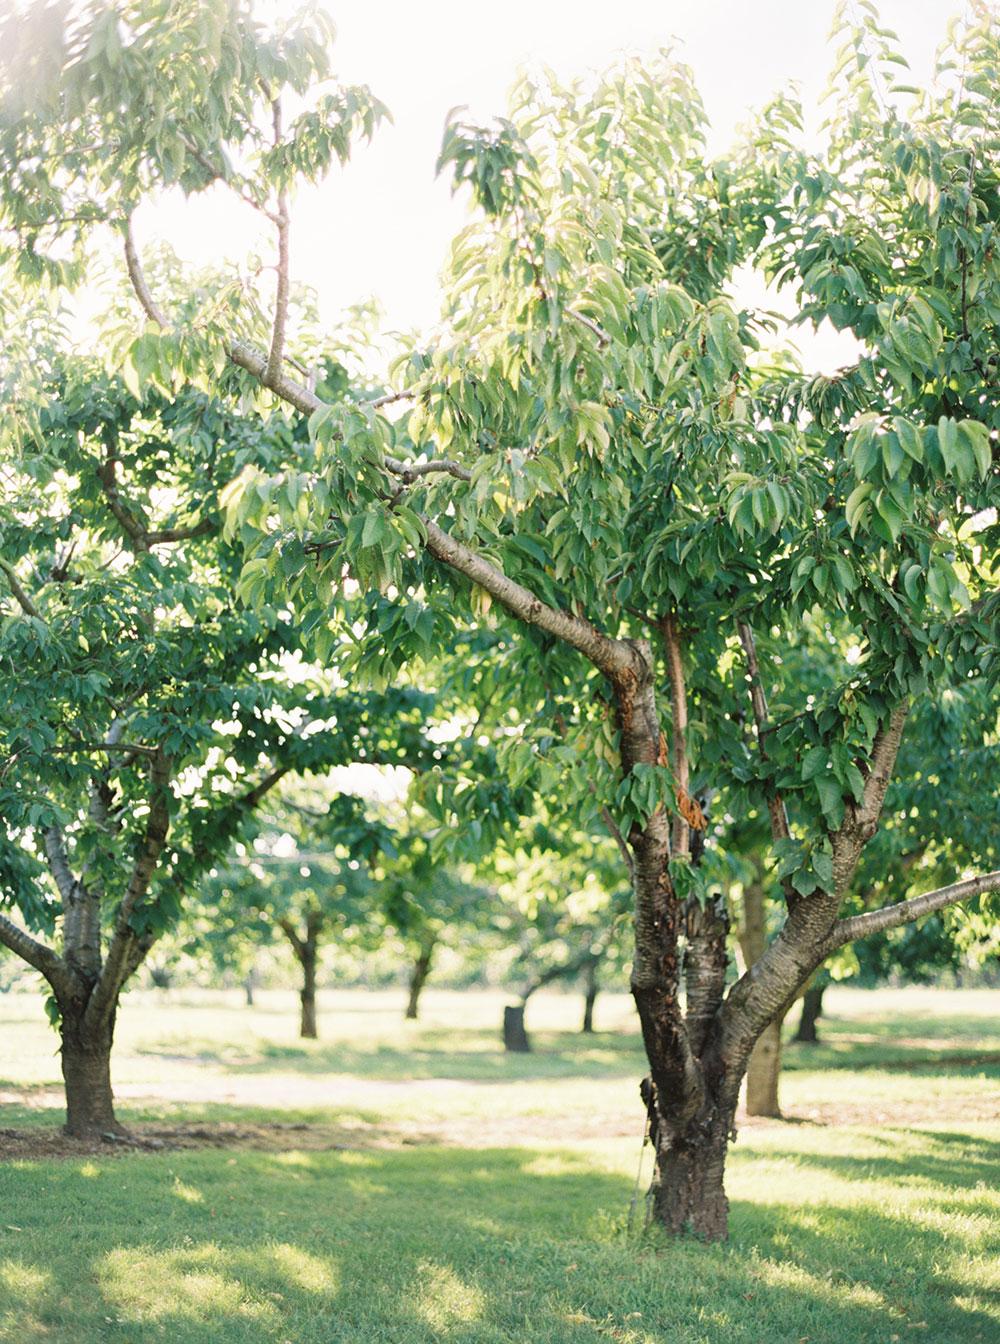 kurtz-orchards-wedding-gracewood-estate-niagara-on-the-lake-photo-by-katie-nicolle-photography-0072.JPG